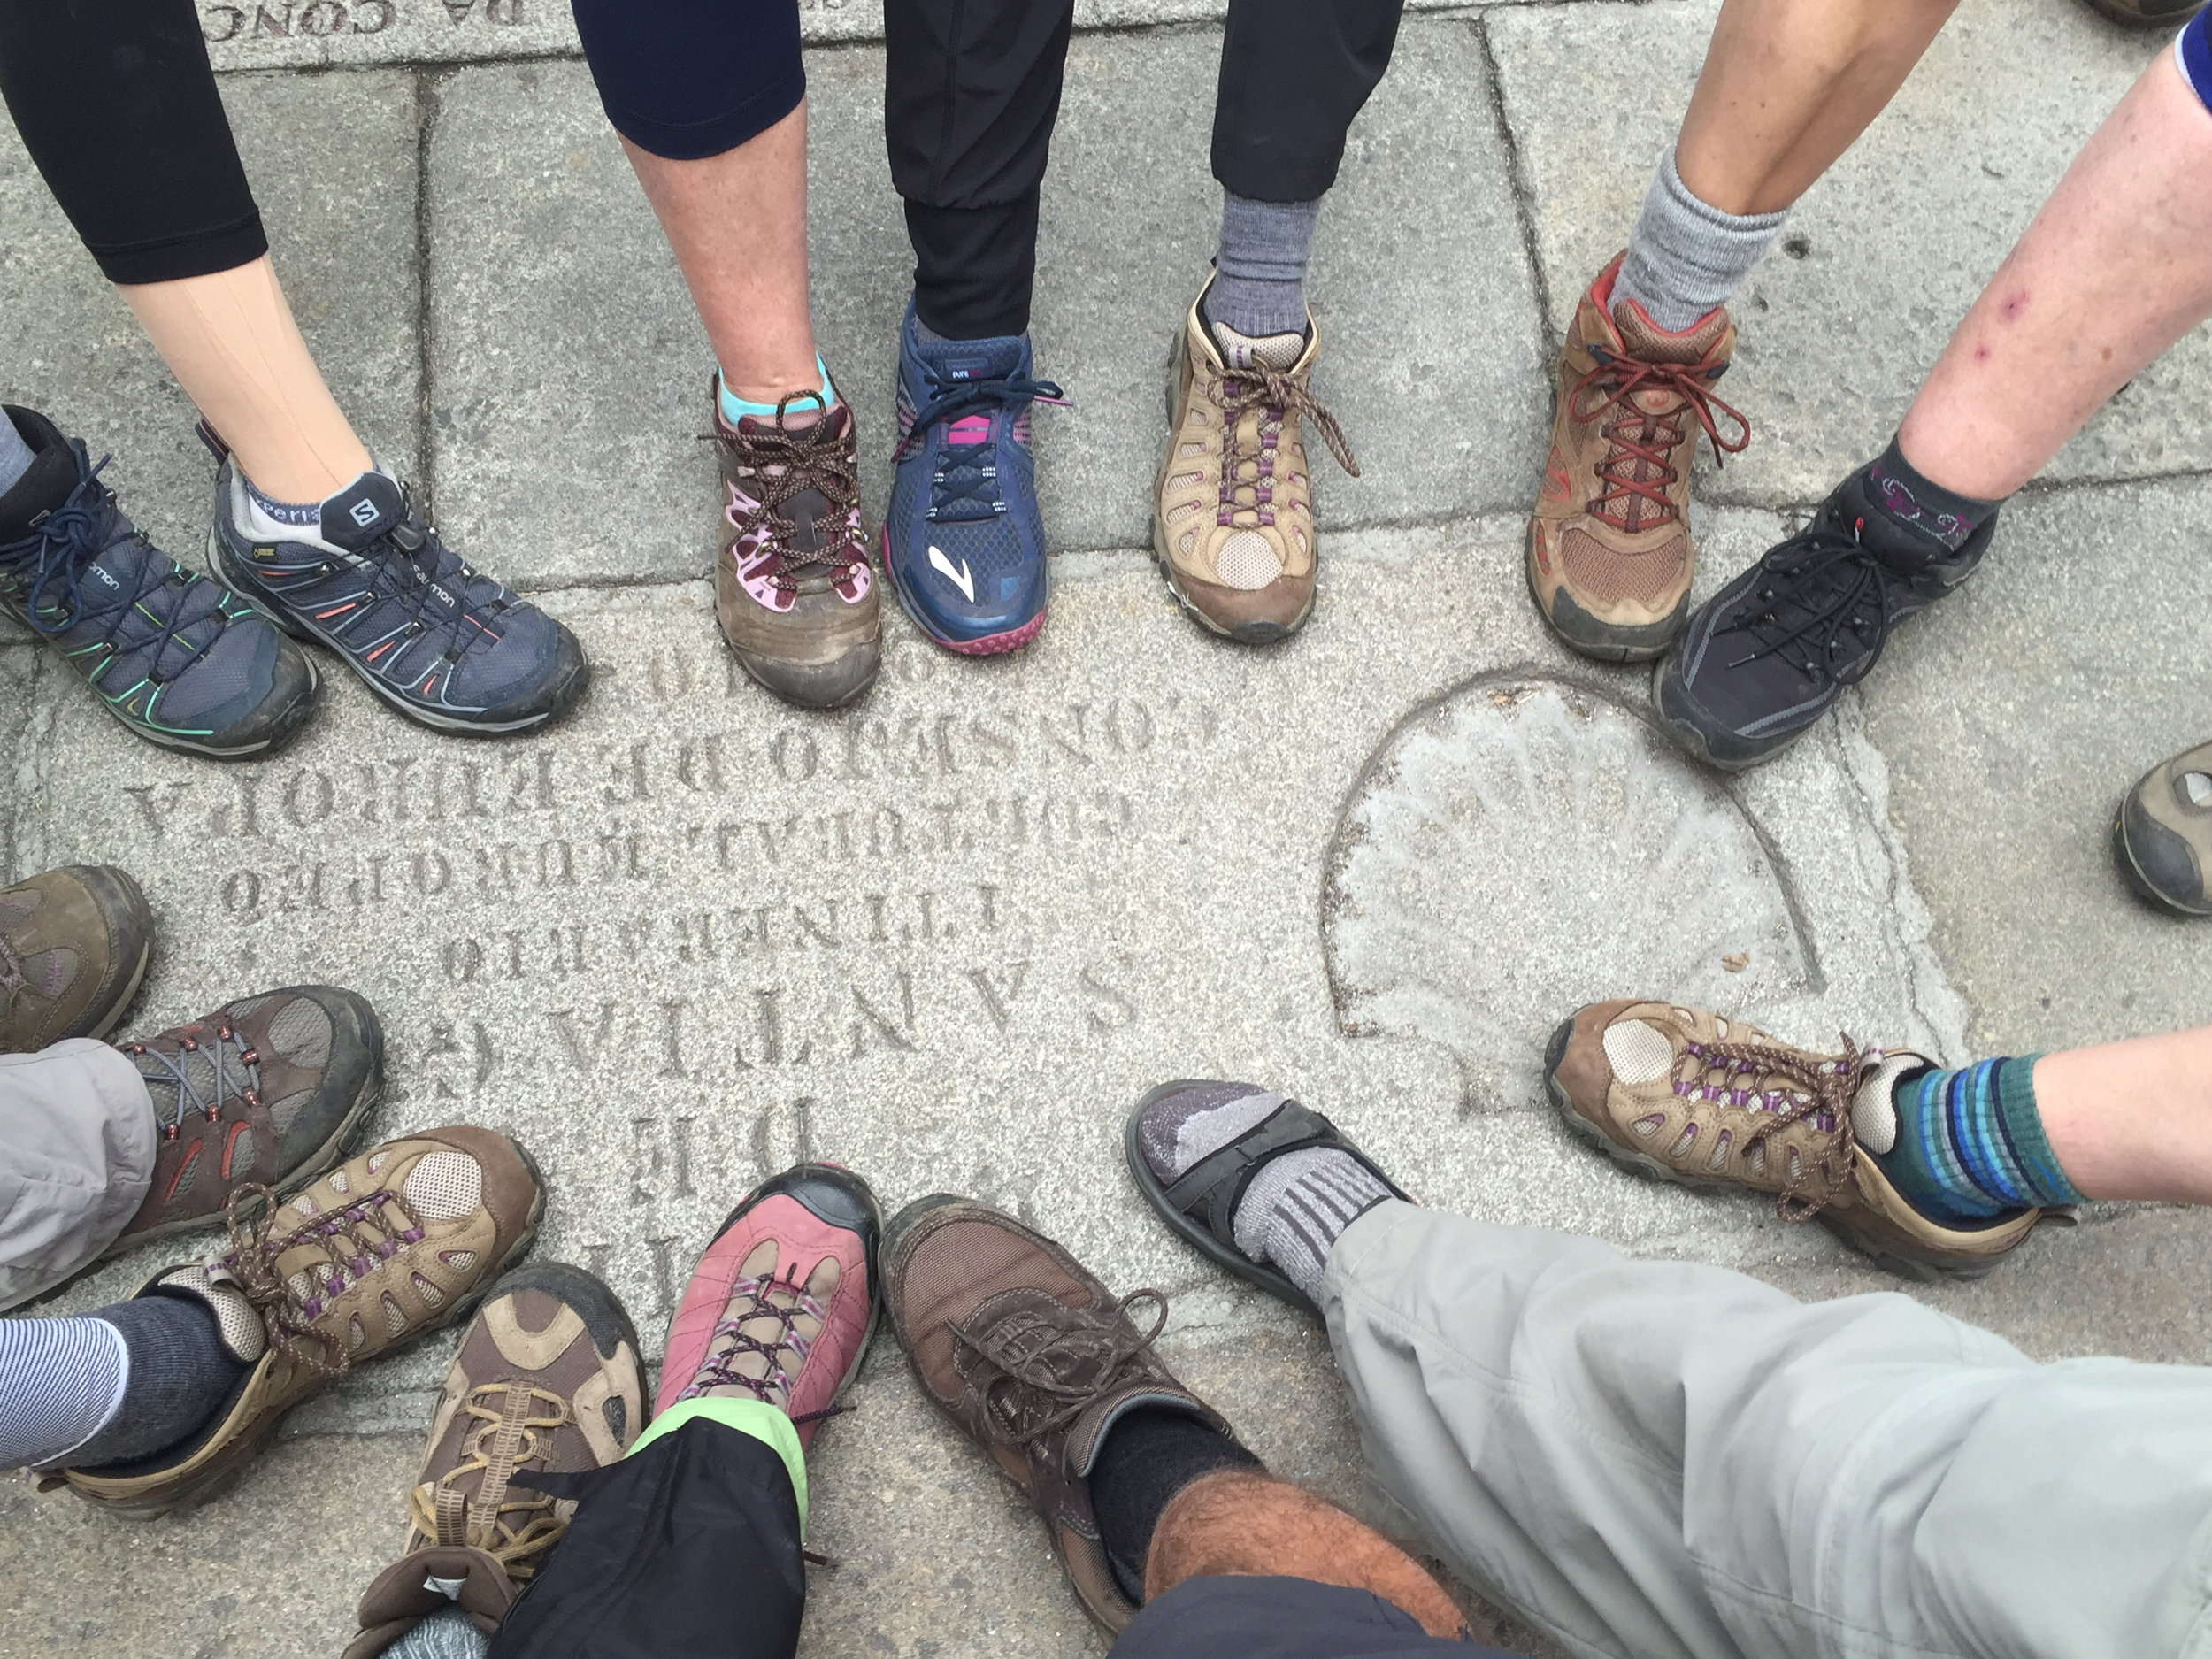 Camino de Santiago Pilgrim feet